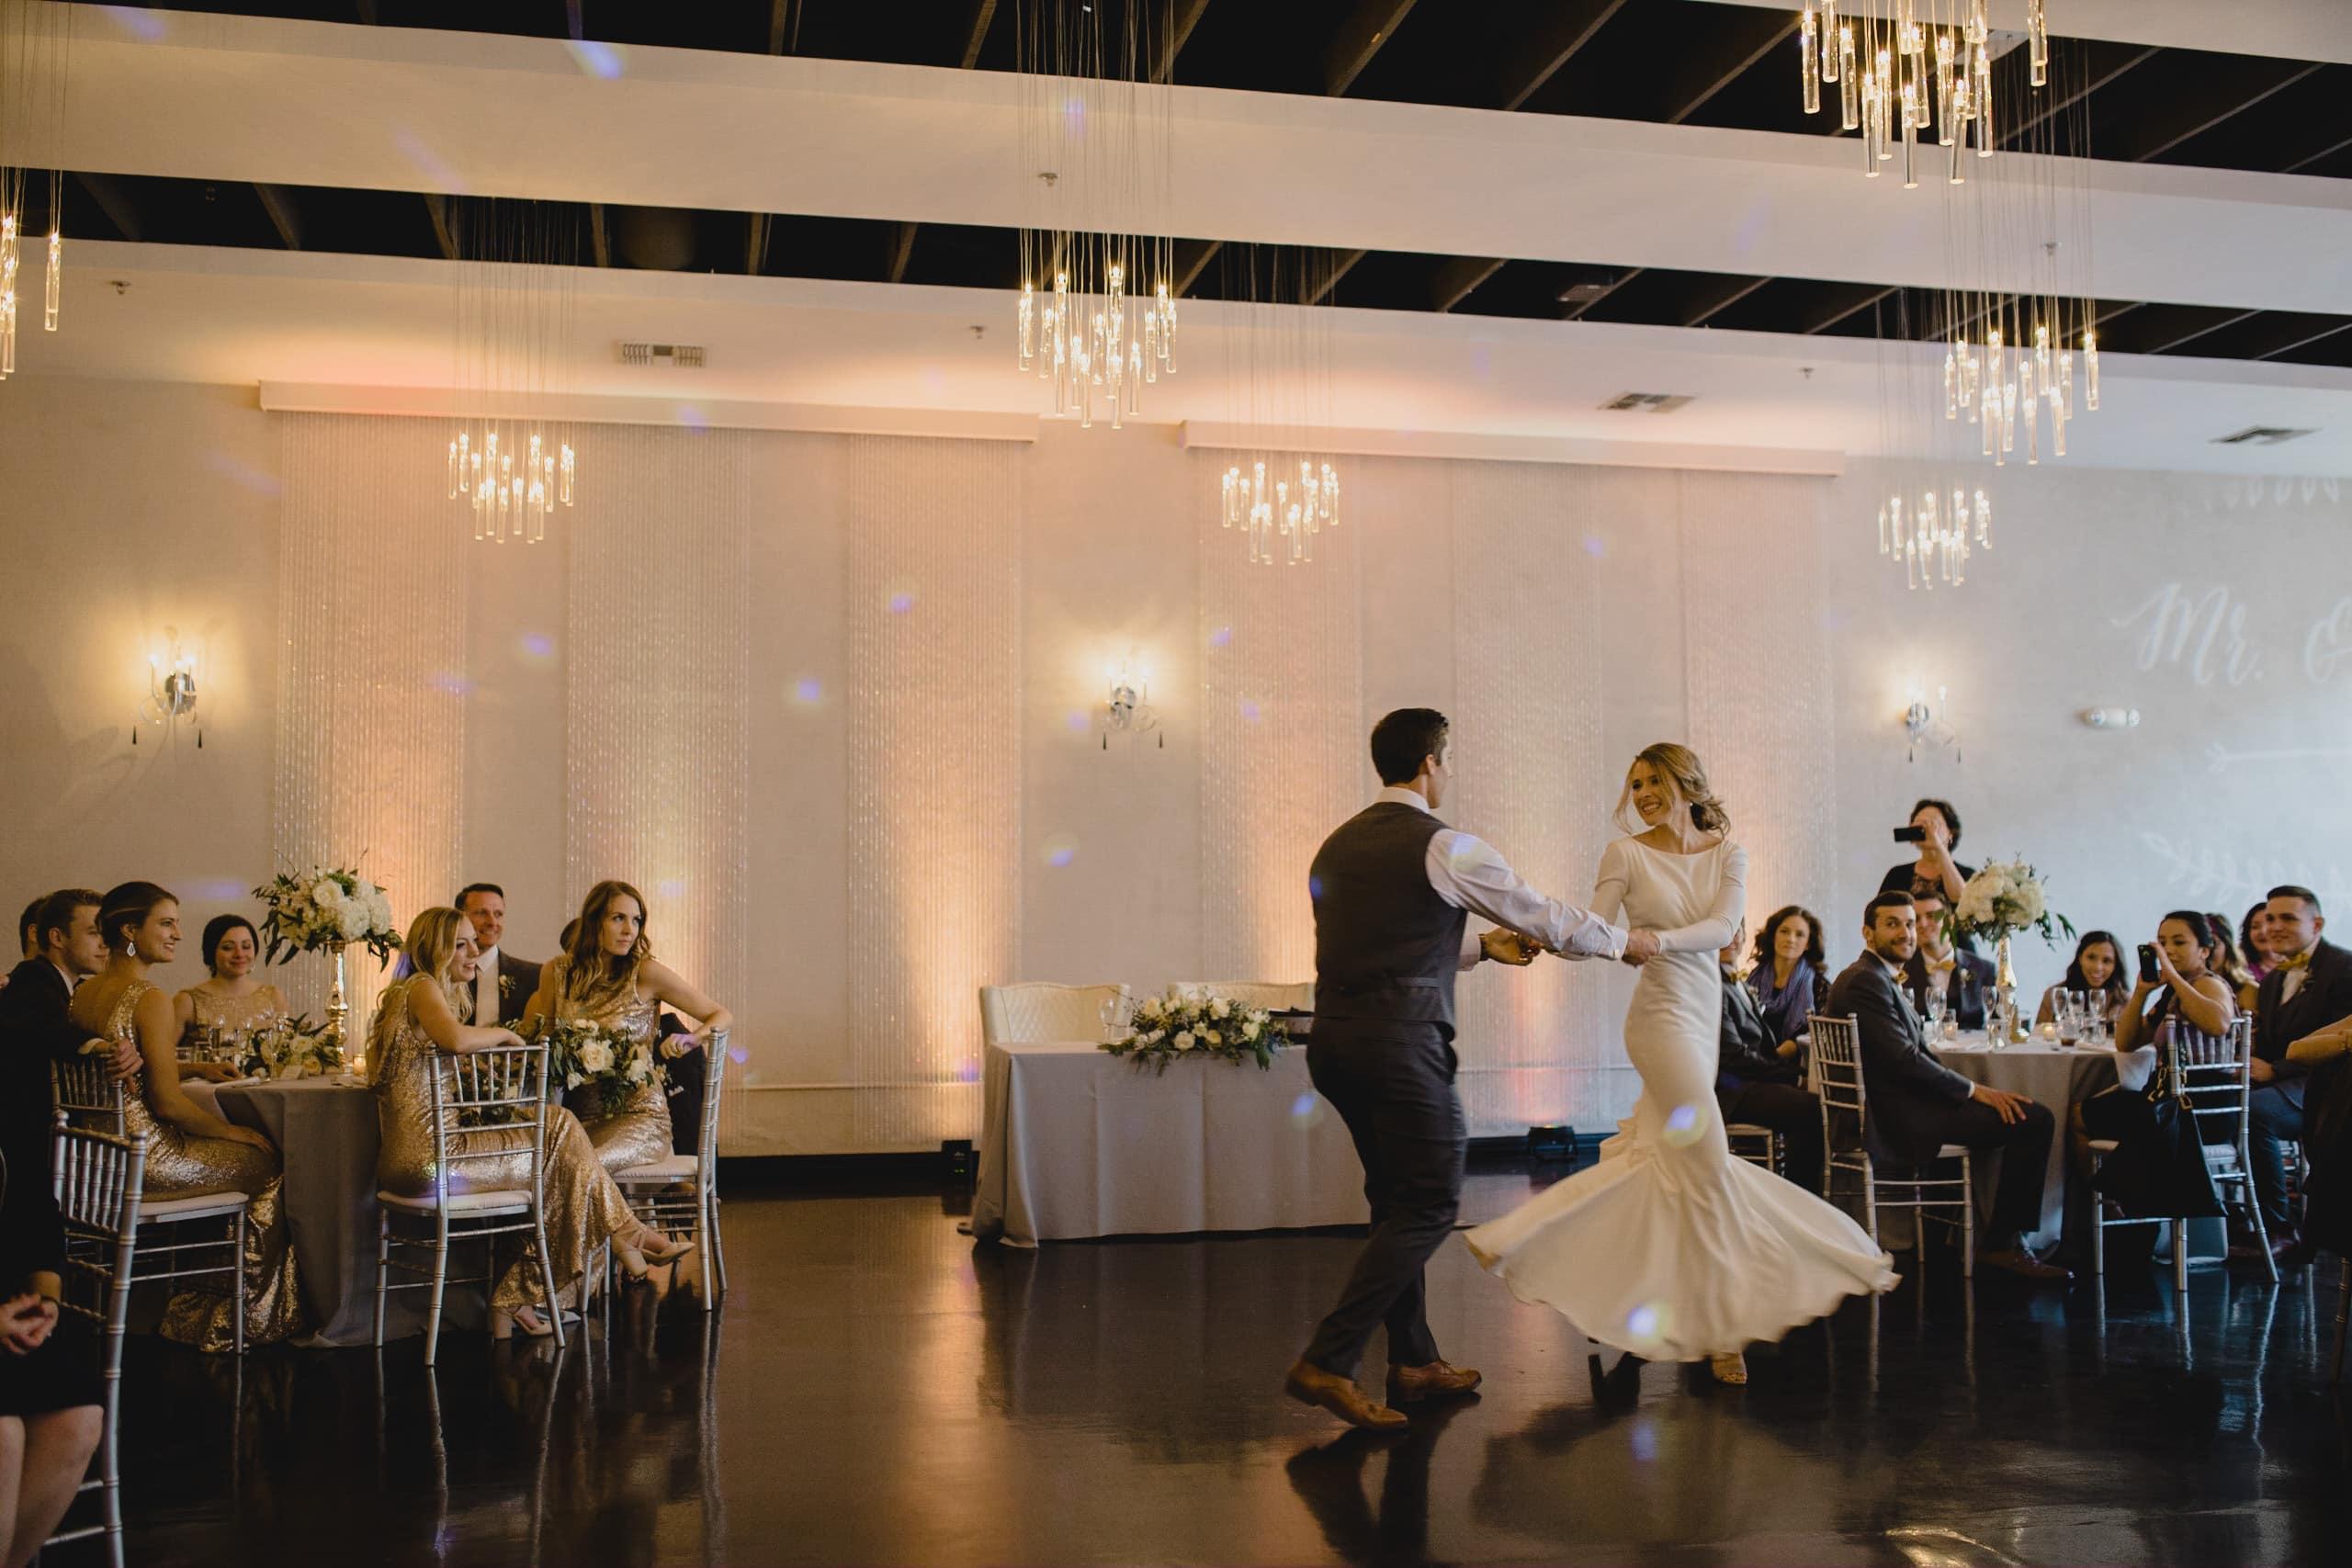 wedding reception at Soho63 bride and groom dancing